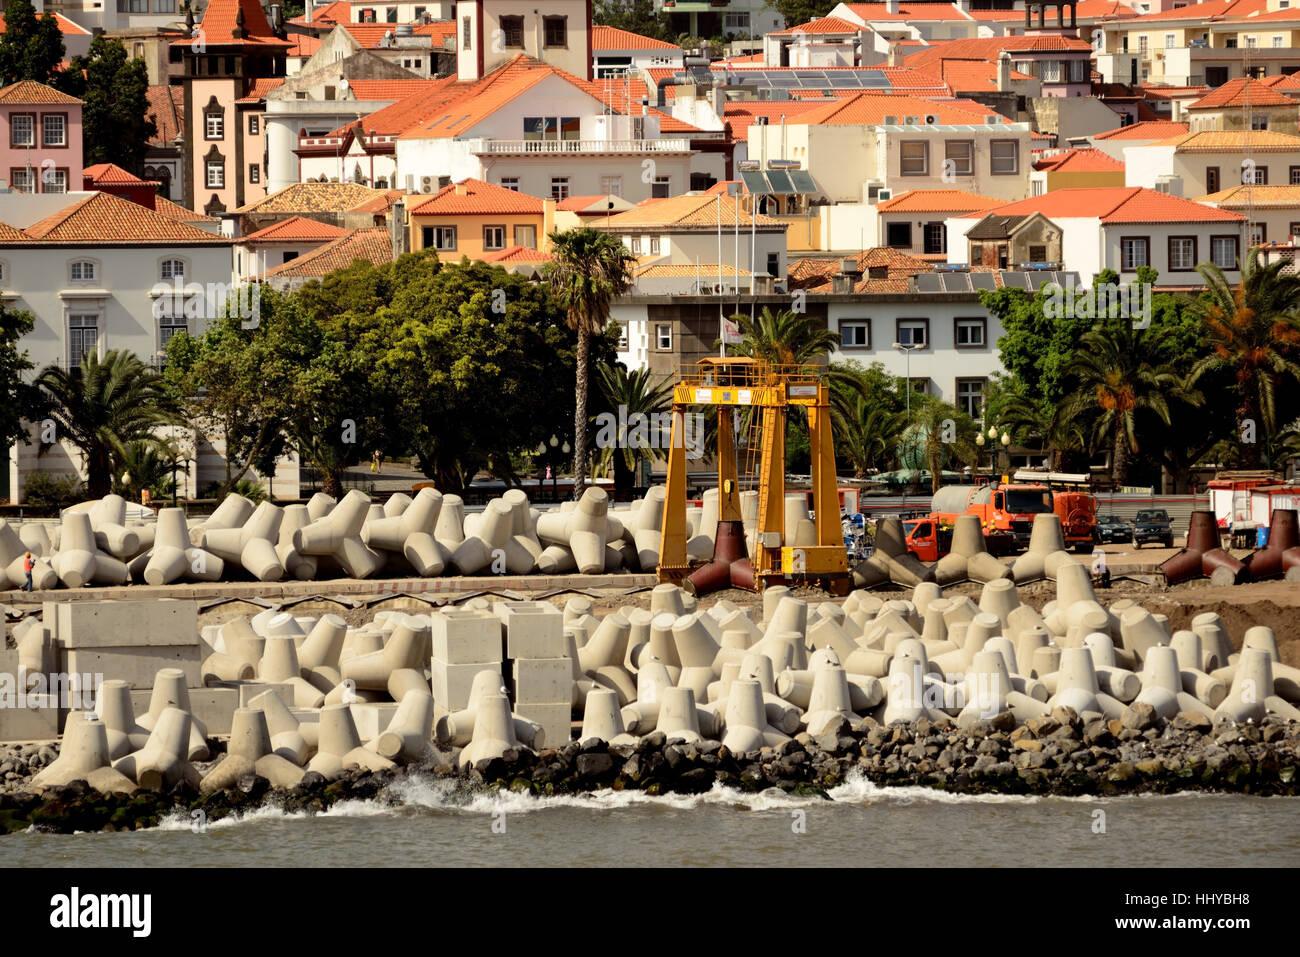 Concrete sea defences (tetrapods). Stock Photo